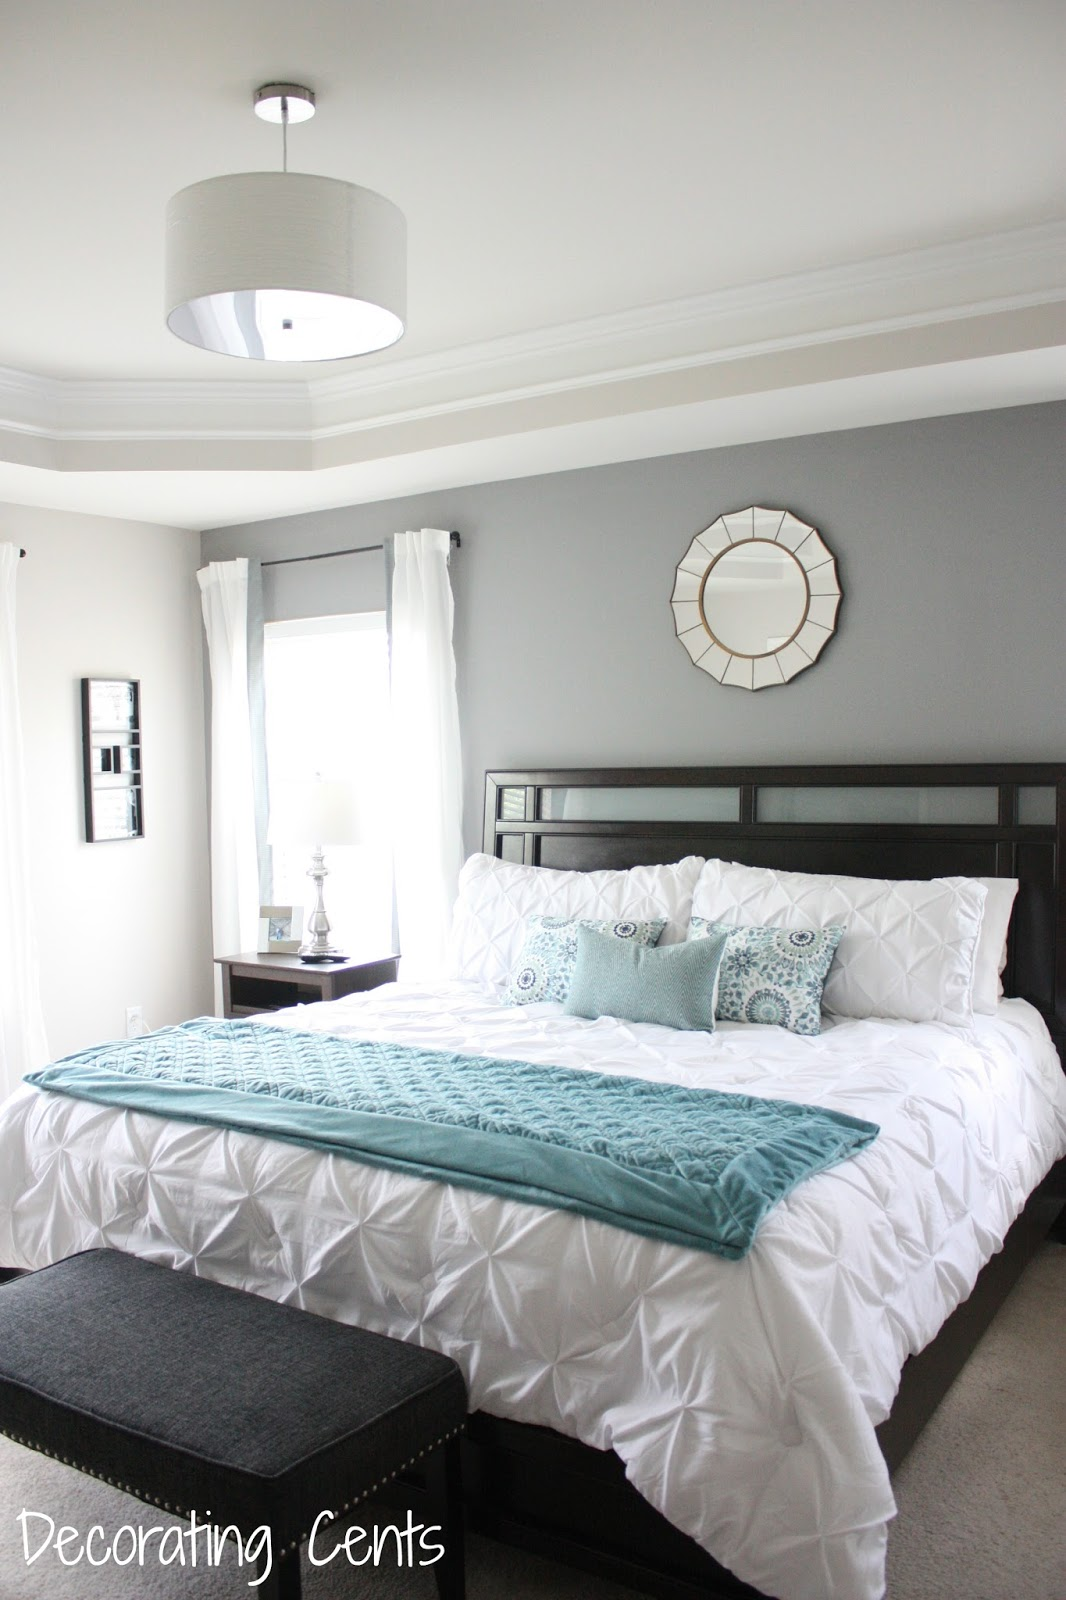 Decorating Cents: Master Bedroom Source List